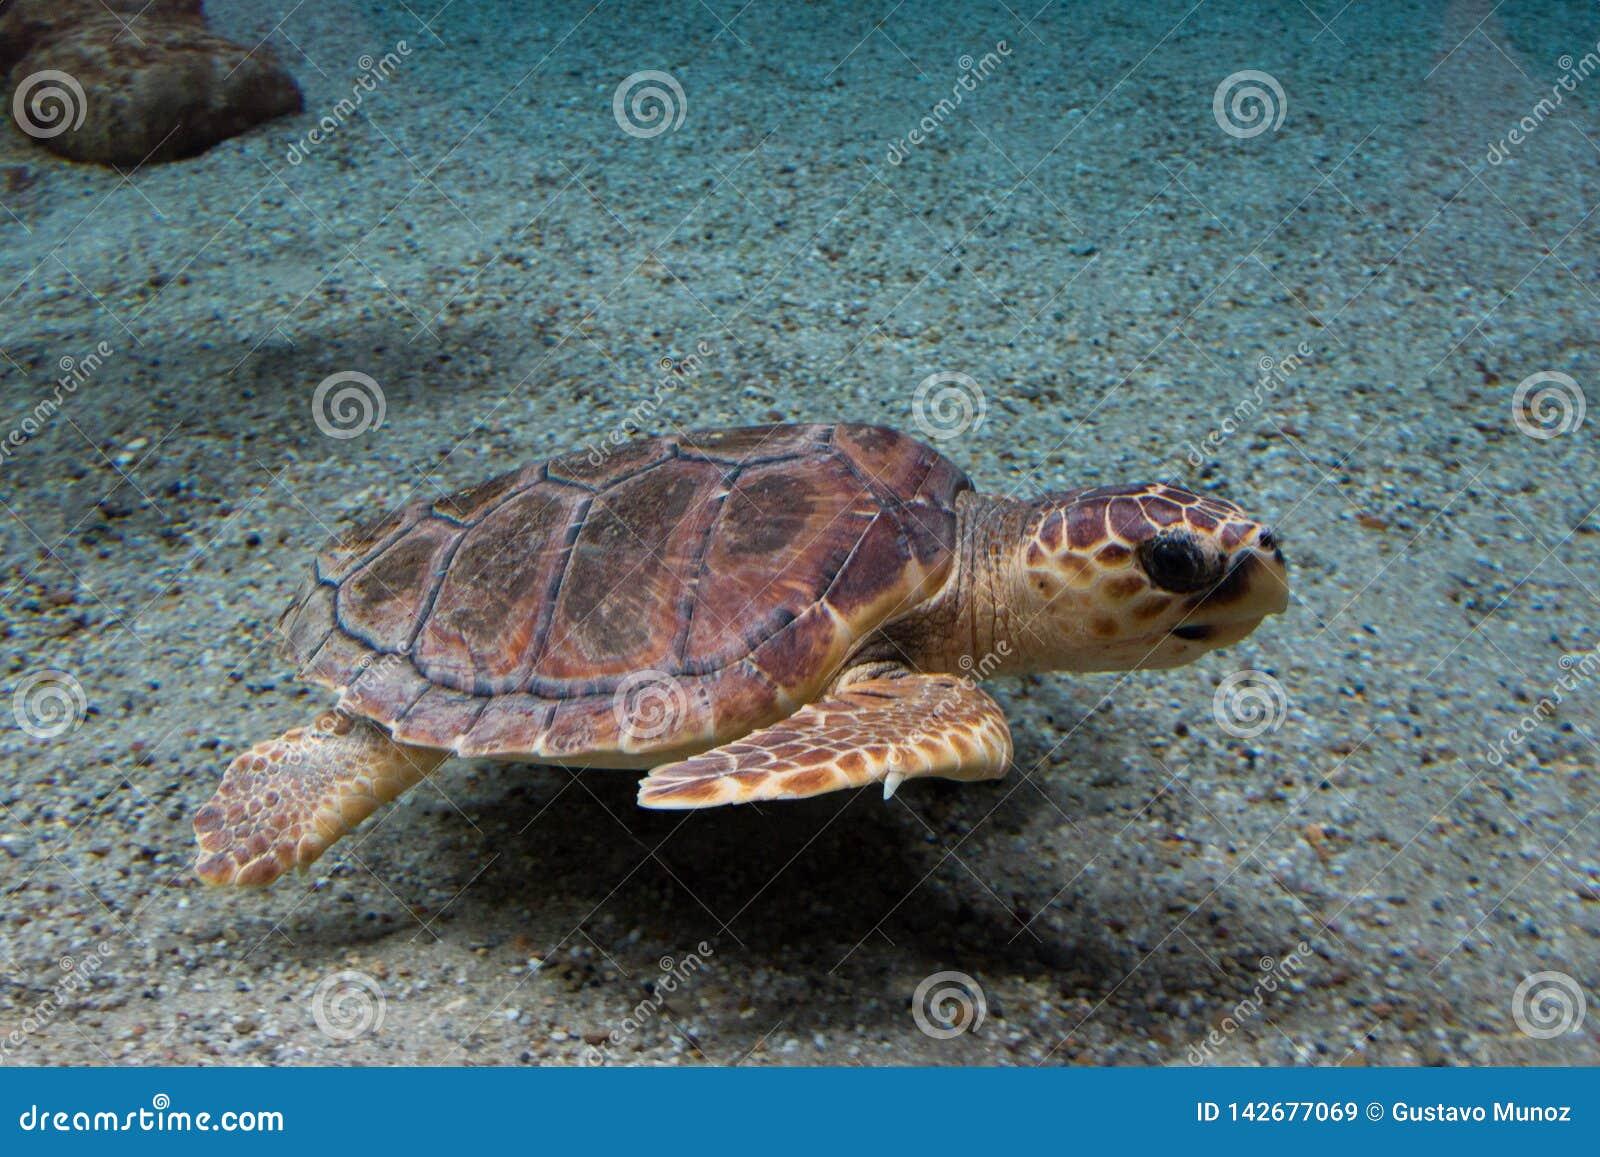 Caretta Caretta морской черепахи морской черепахи, также известный как морская черепаха Одичалое животное жизни